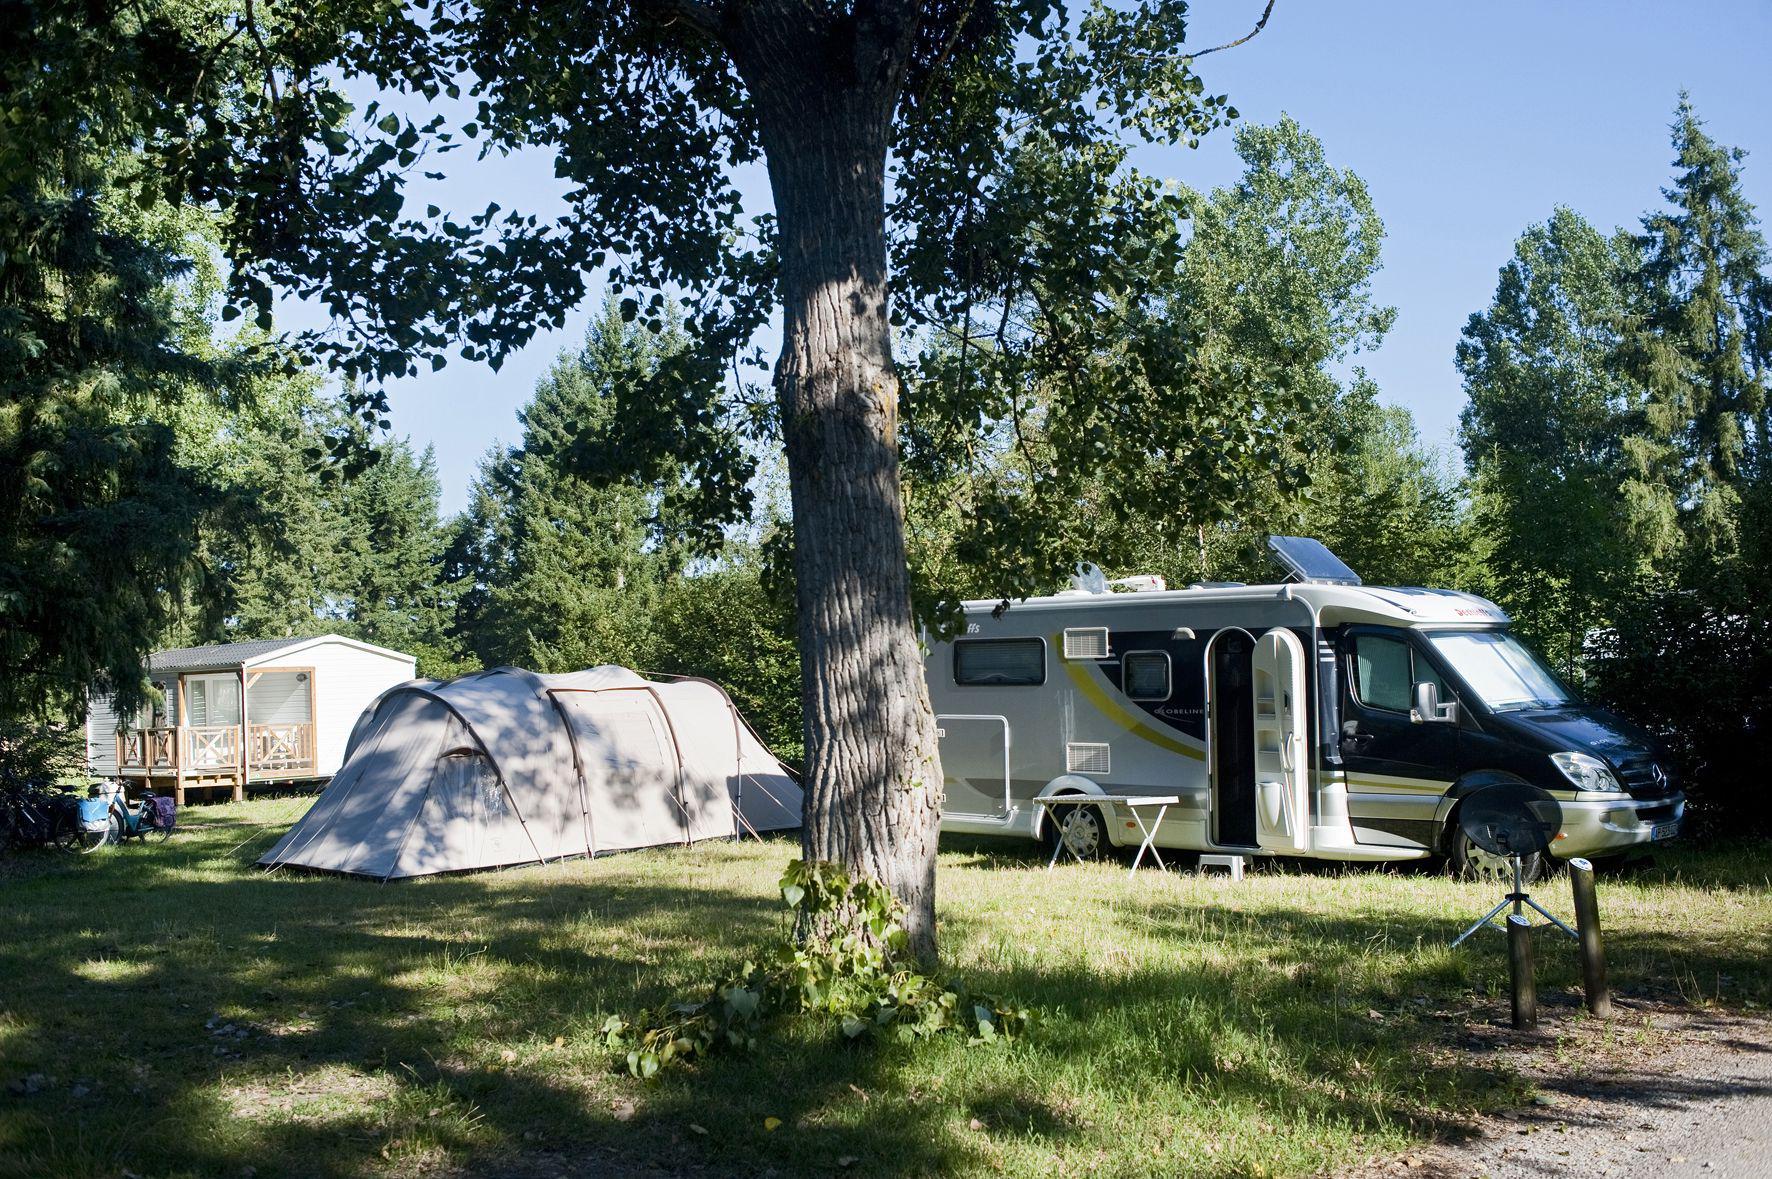 Campsites in Haut-Rhin | Best Camping in Haut-Rhin, France